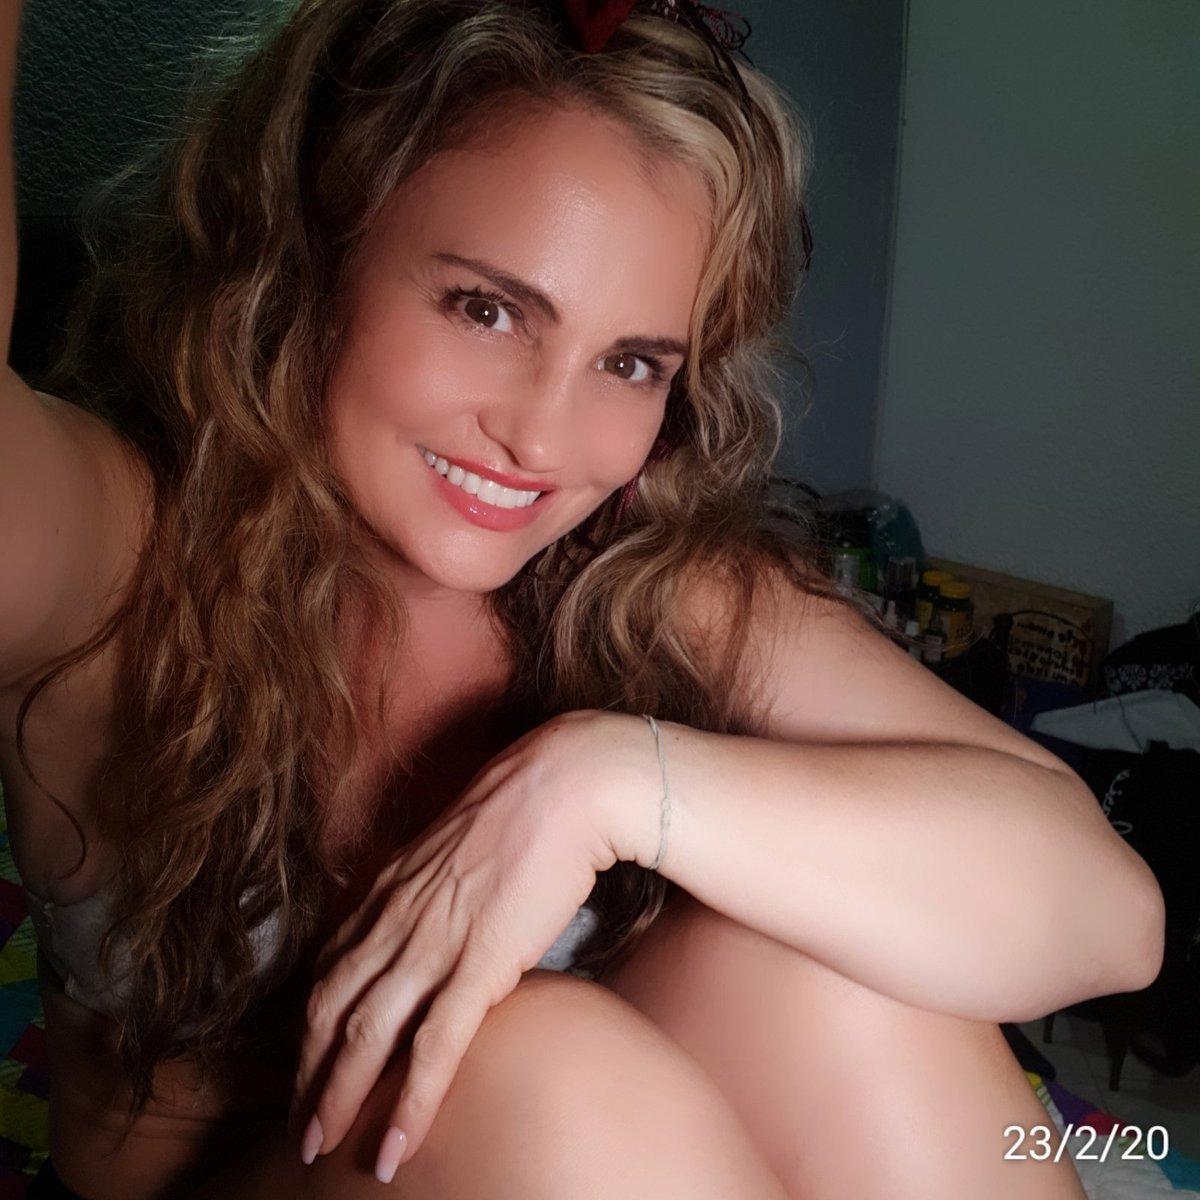 A gift for you...#MotivationMonday #24Febrero #Feliz #auracristinageithner#beautiful #lapotradelabanda #Colombia #happy #vscocam #girl #instagramers #iger #love #loveyouall #actresslife #model #loveislove #smile #follow #2020pic.twitter.com/EKjaJME3E5